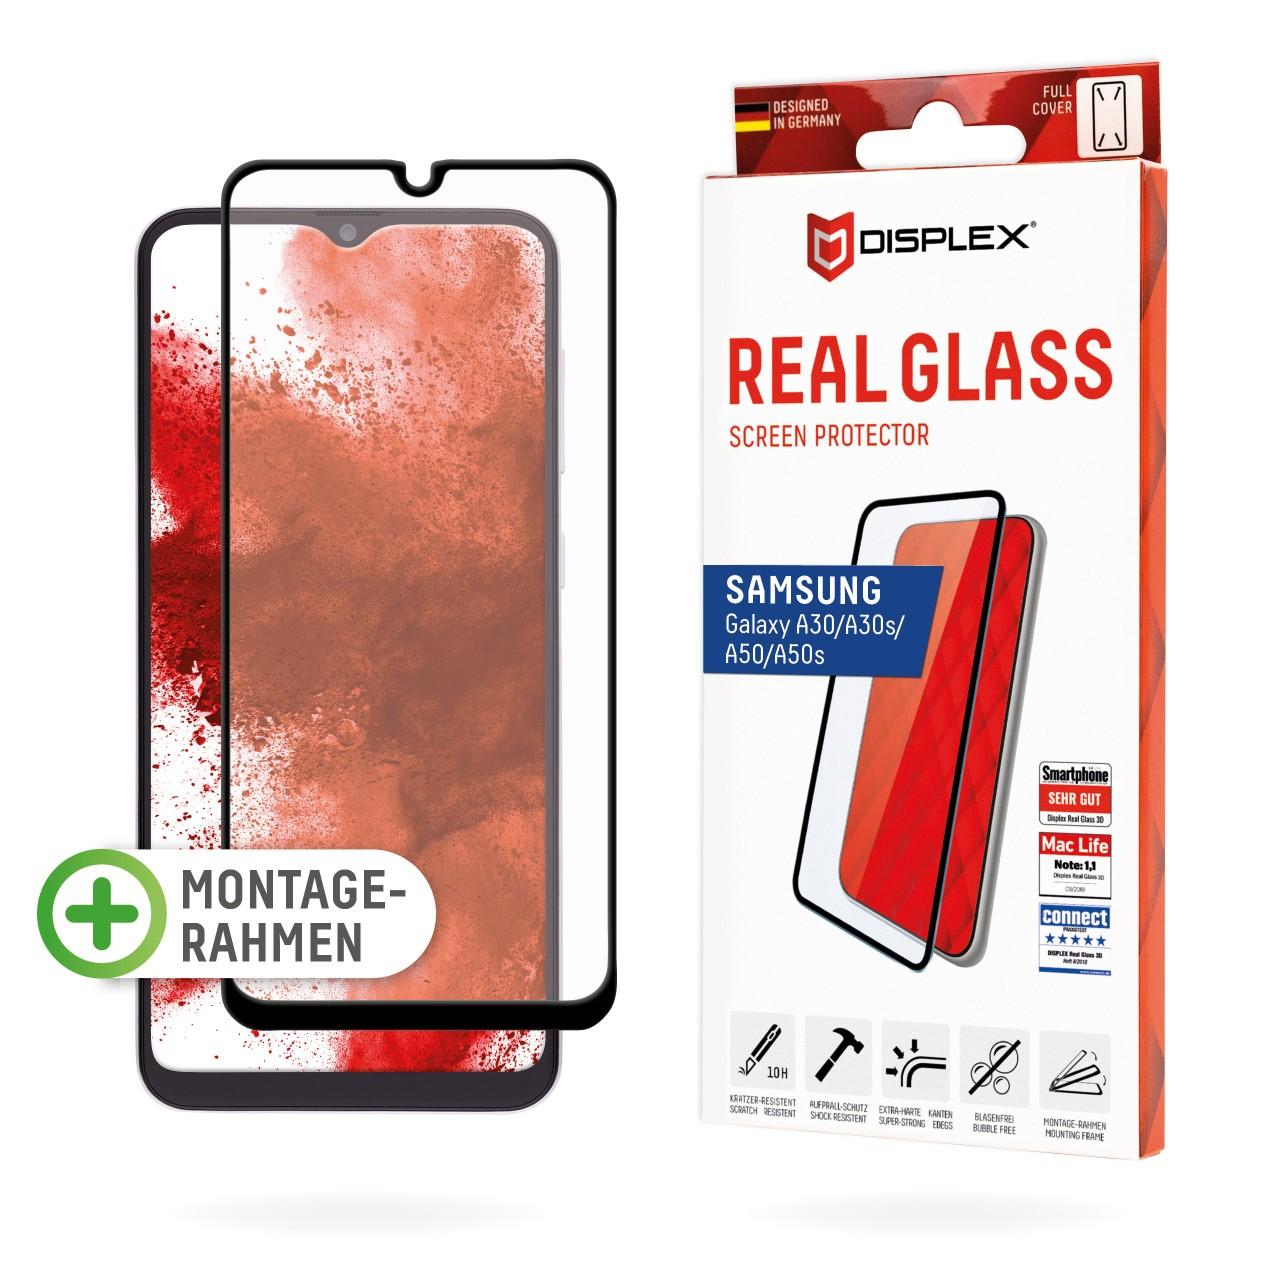 Galaxy A30/A30s/A50/A50s Full Cover Schutzglas